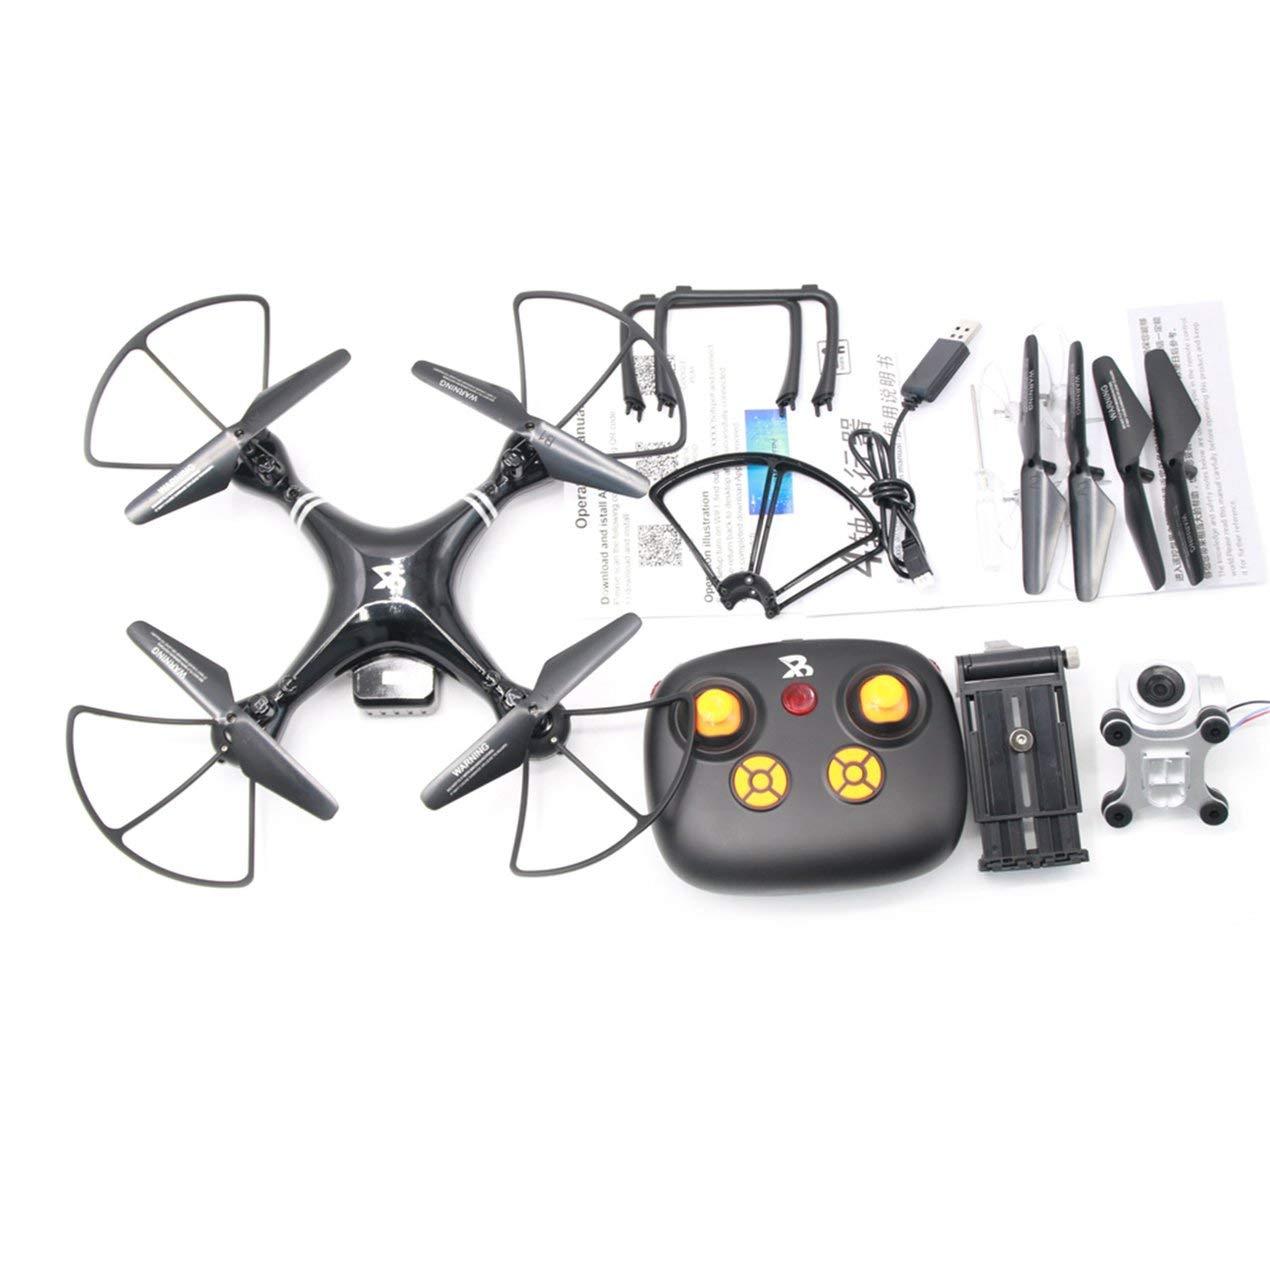 A806 de Cuatro Ejes Drone Mini Aviones del Vuelo del helicóptero Quadcopter 2 megapíxeles